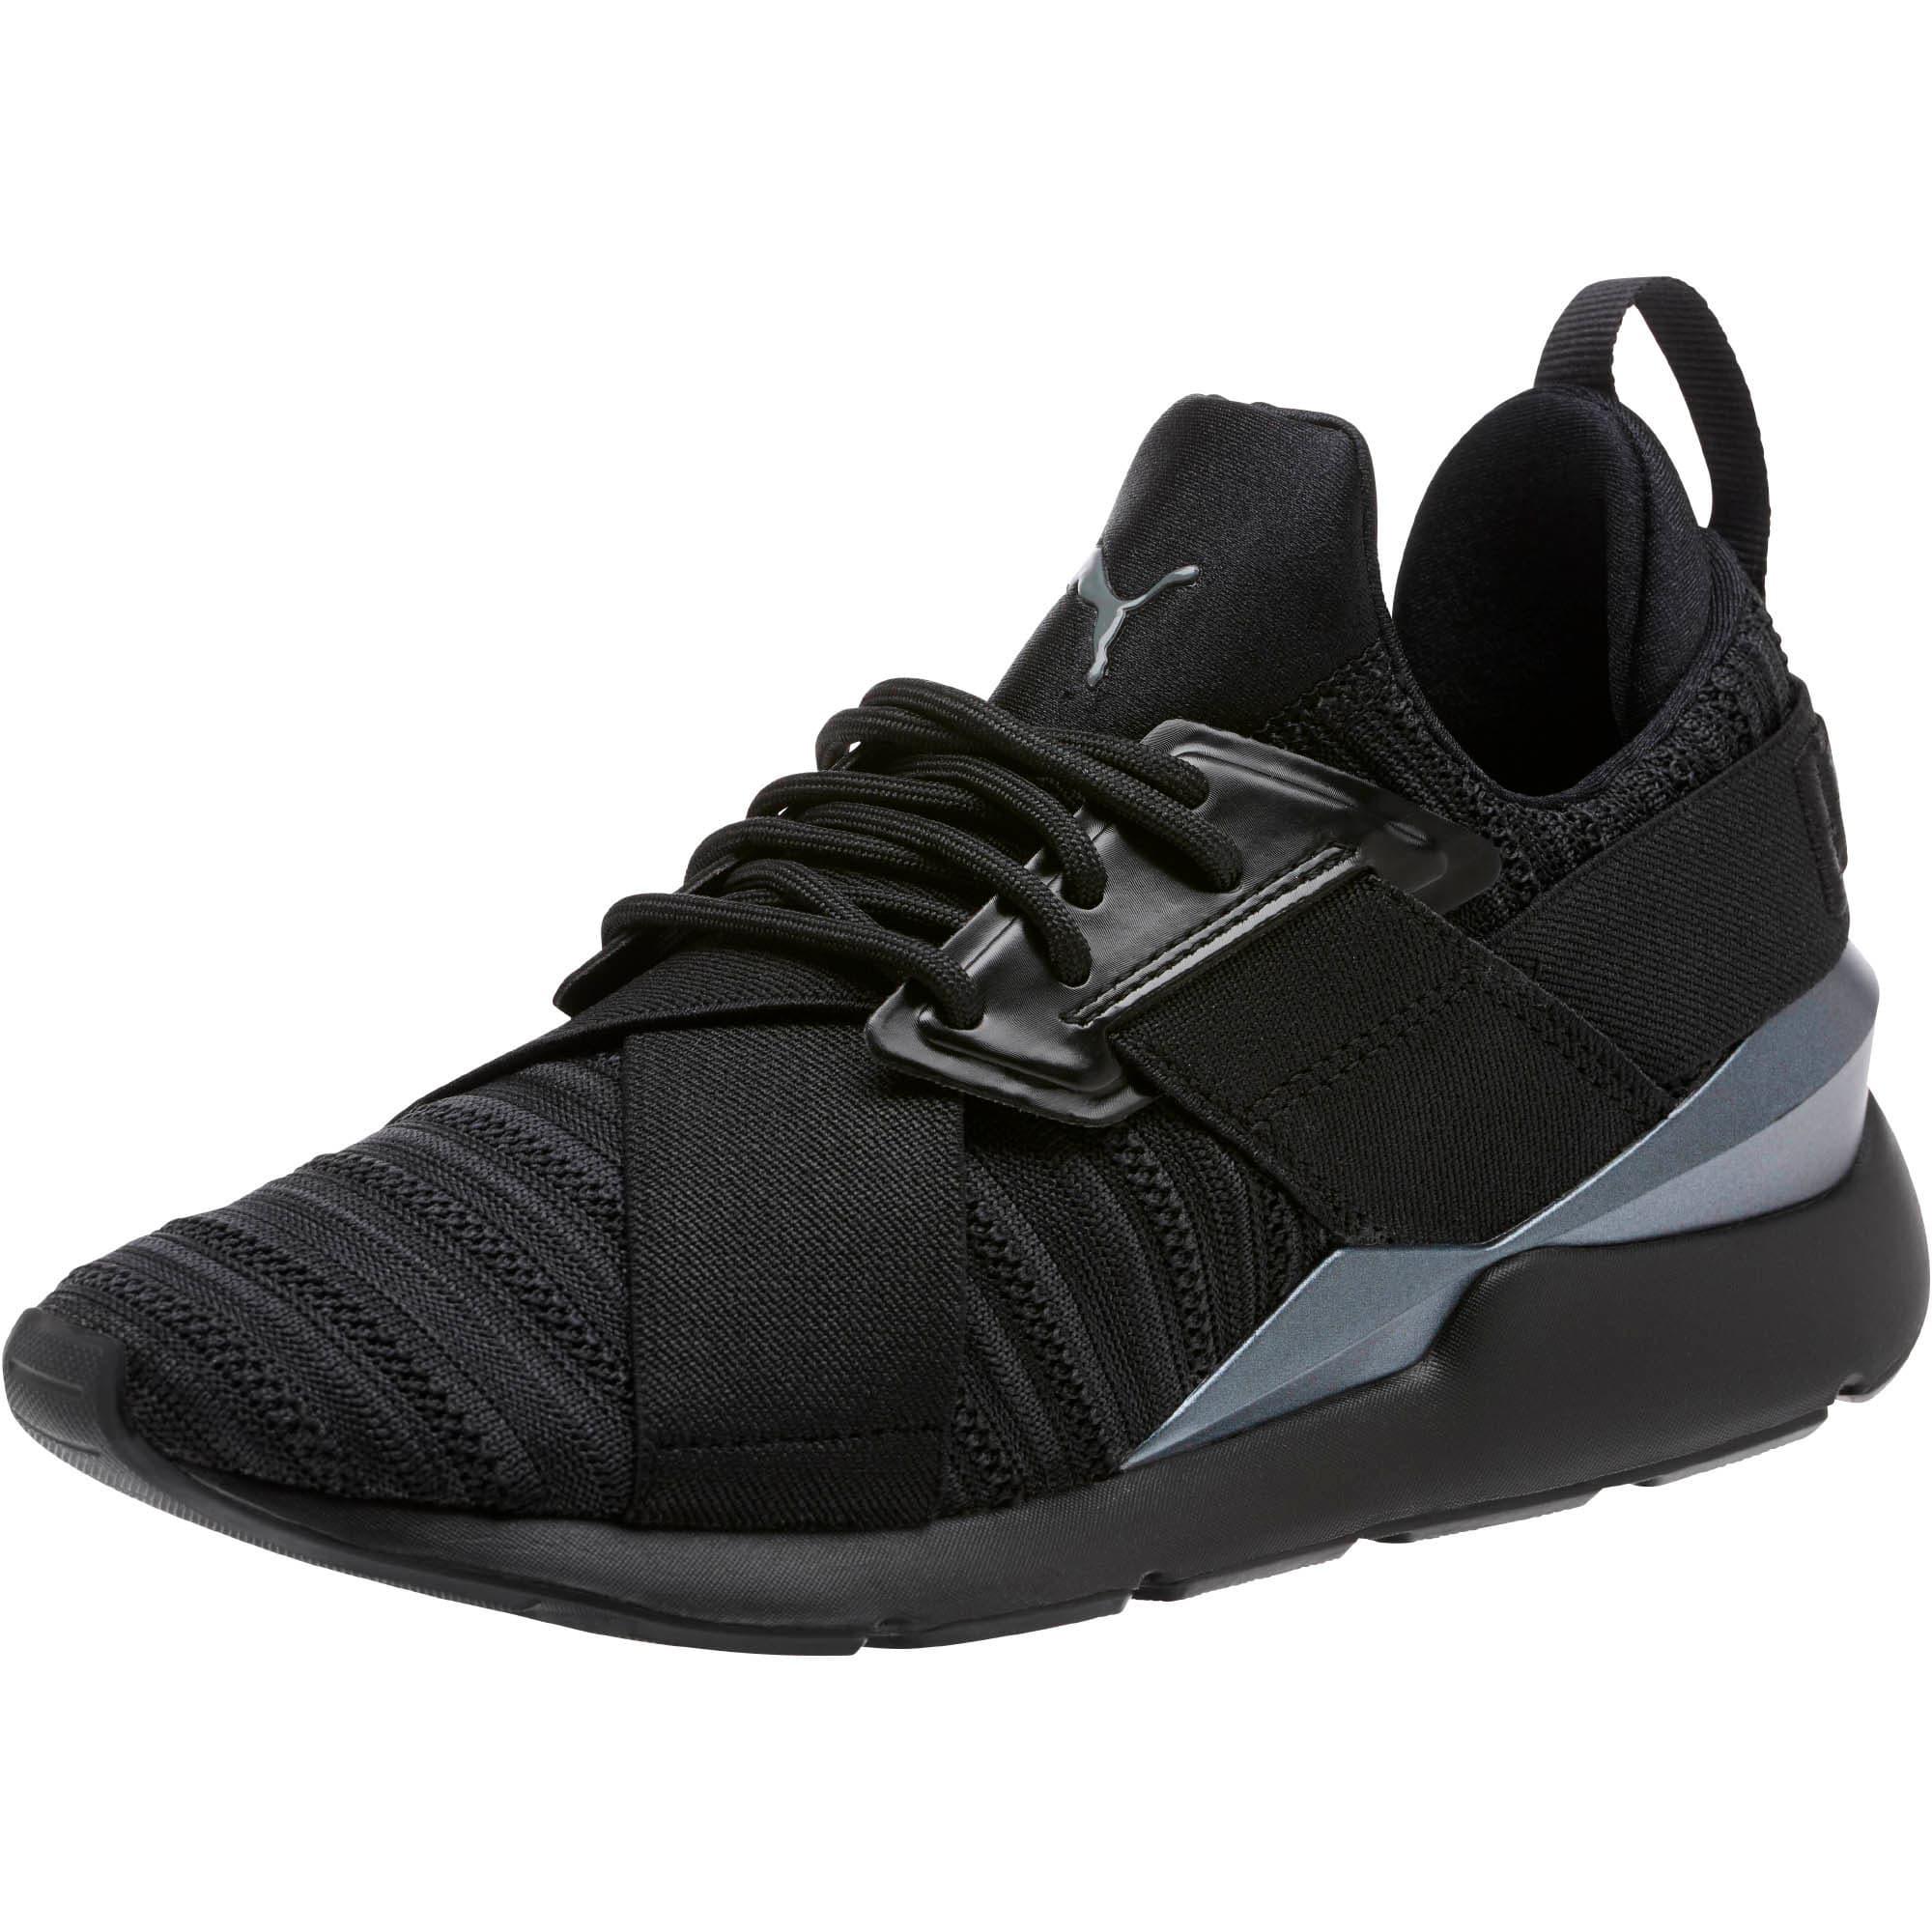 Thumbnail 1 of Muse Knit Women's Sneakers, Iron Gate-Puma Black, medium